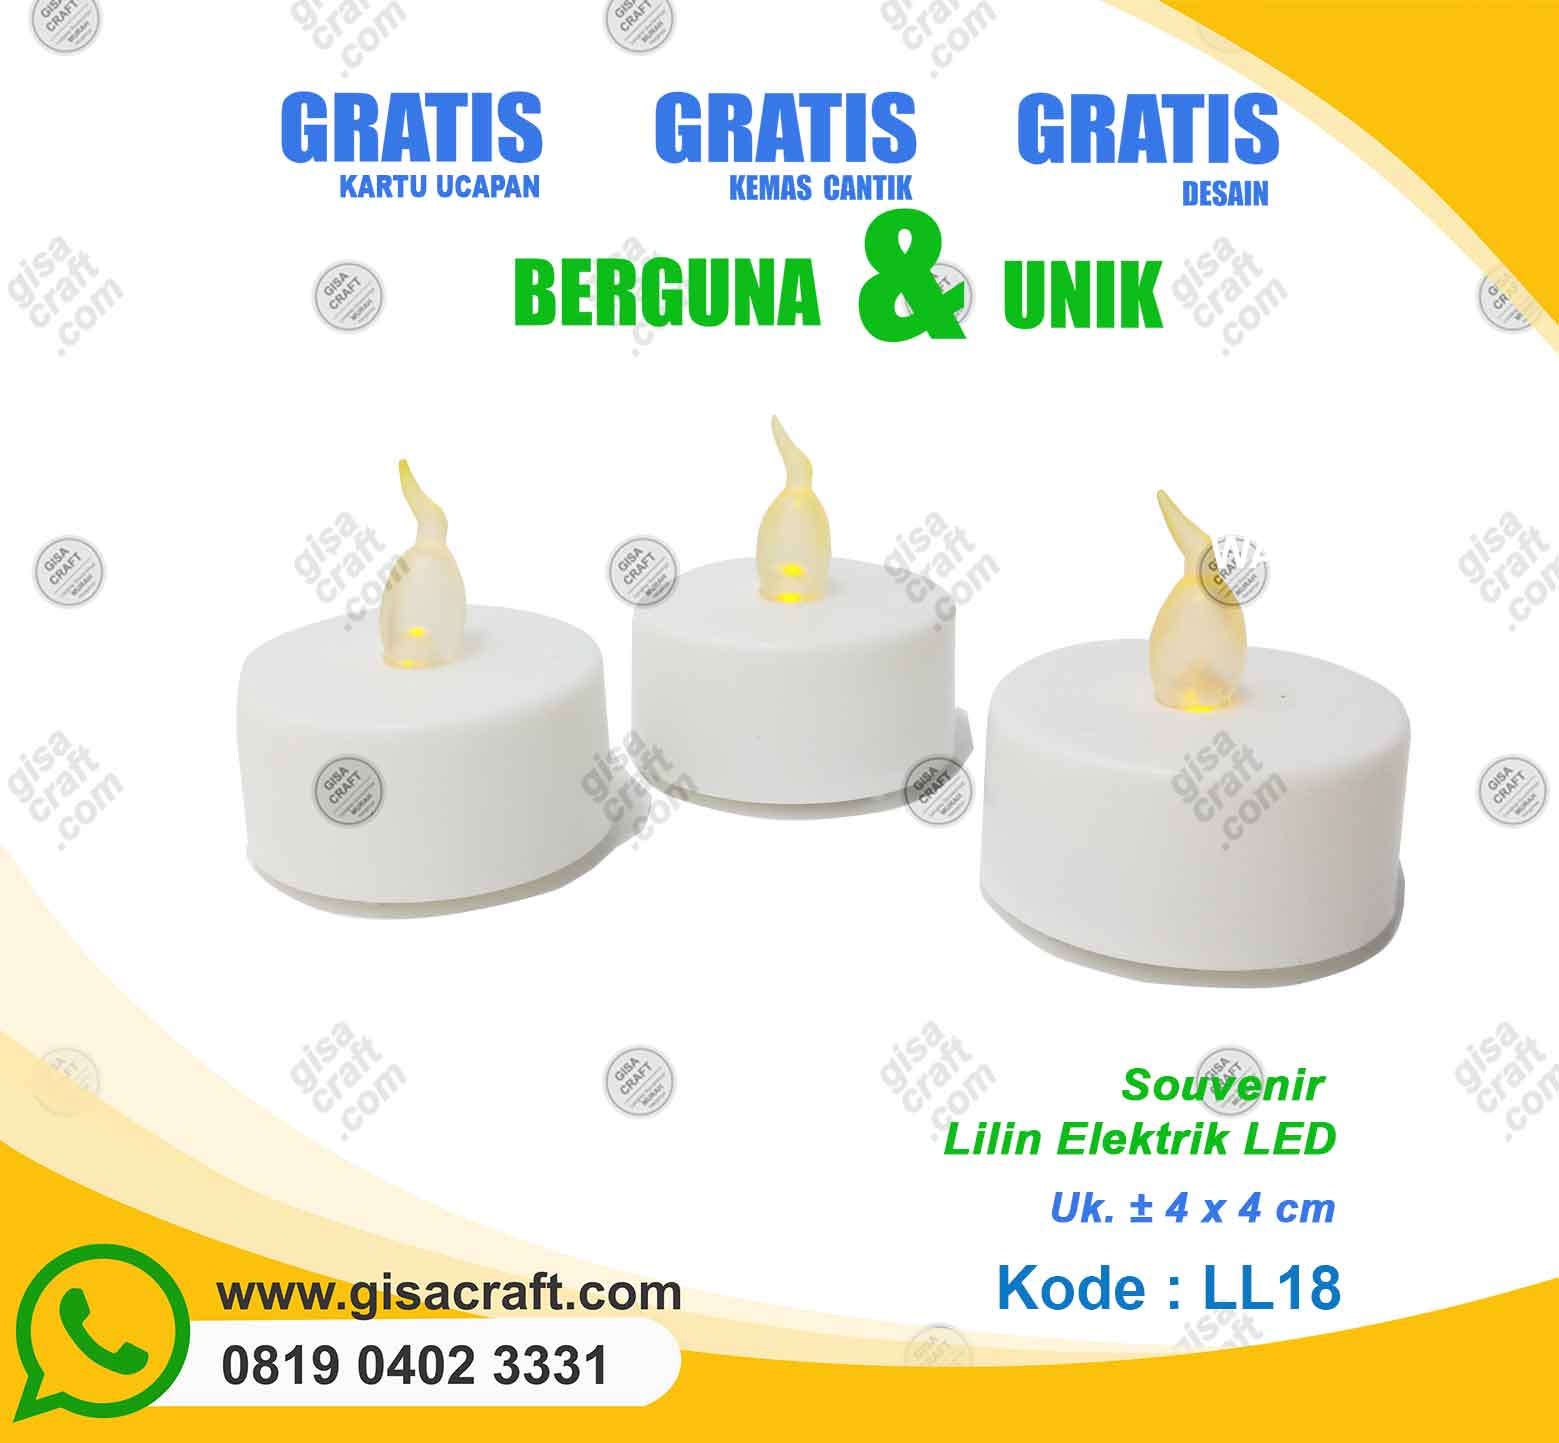 Souvenir Lilin Elektrik LED LL18